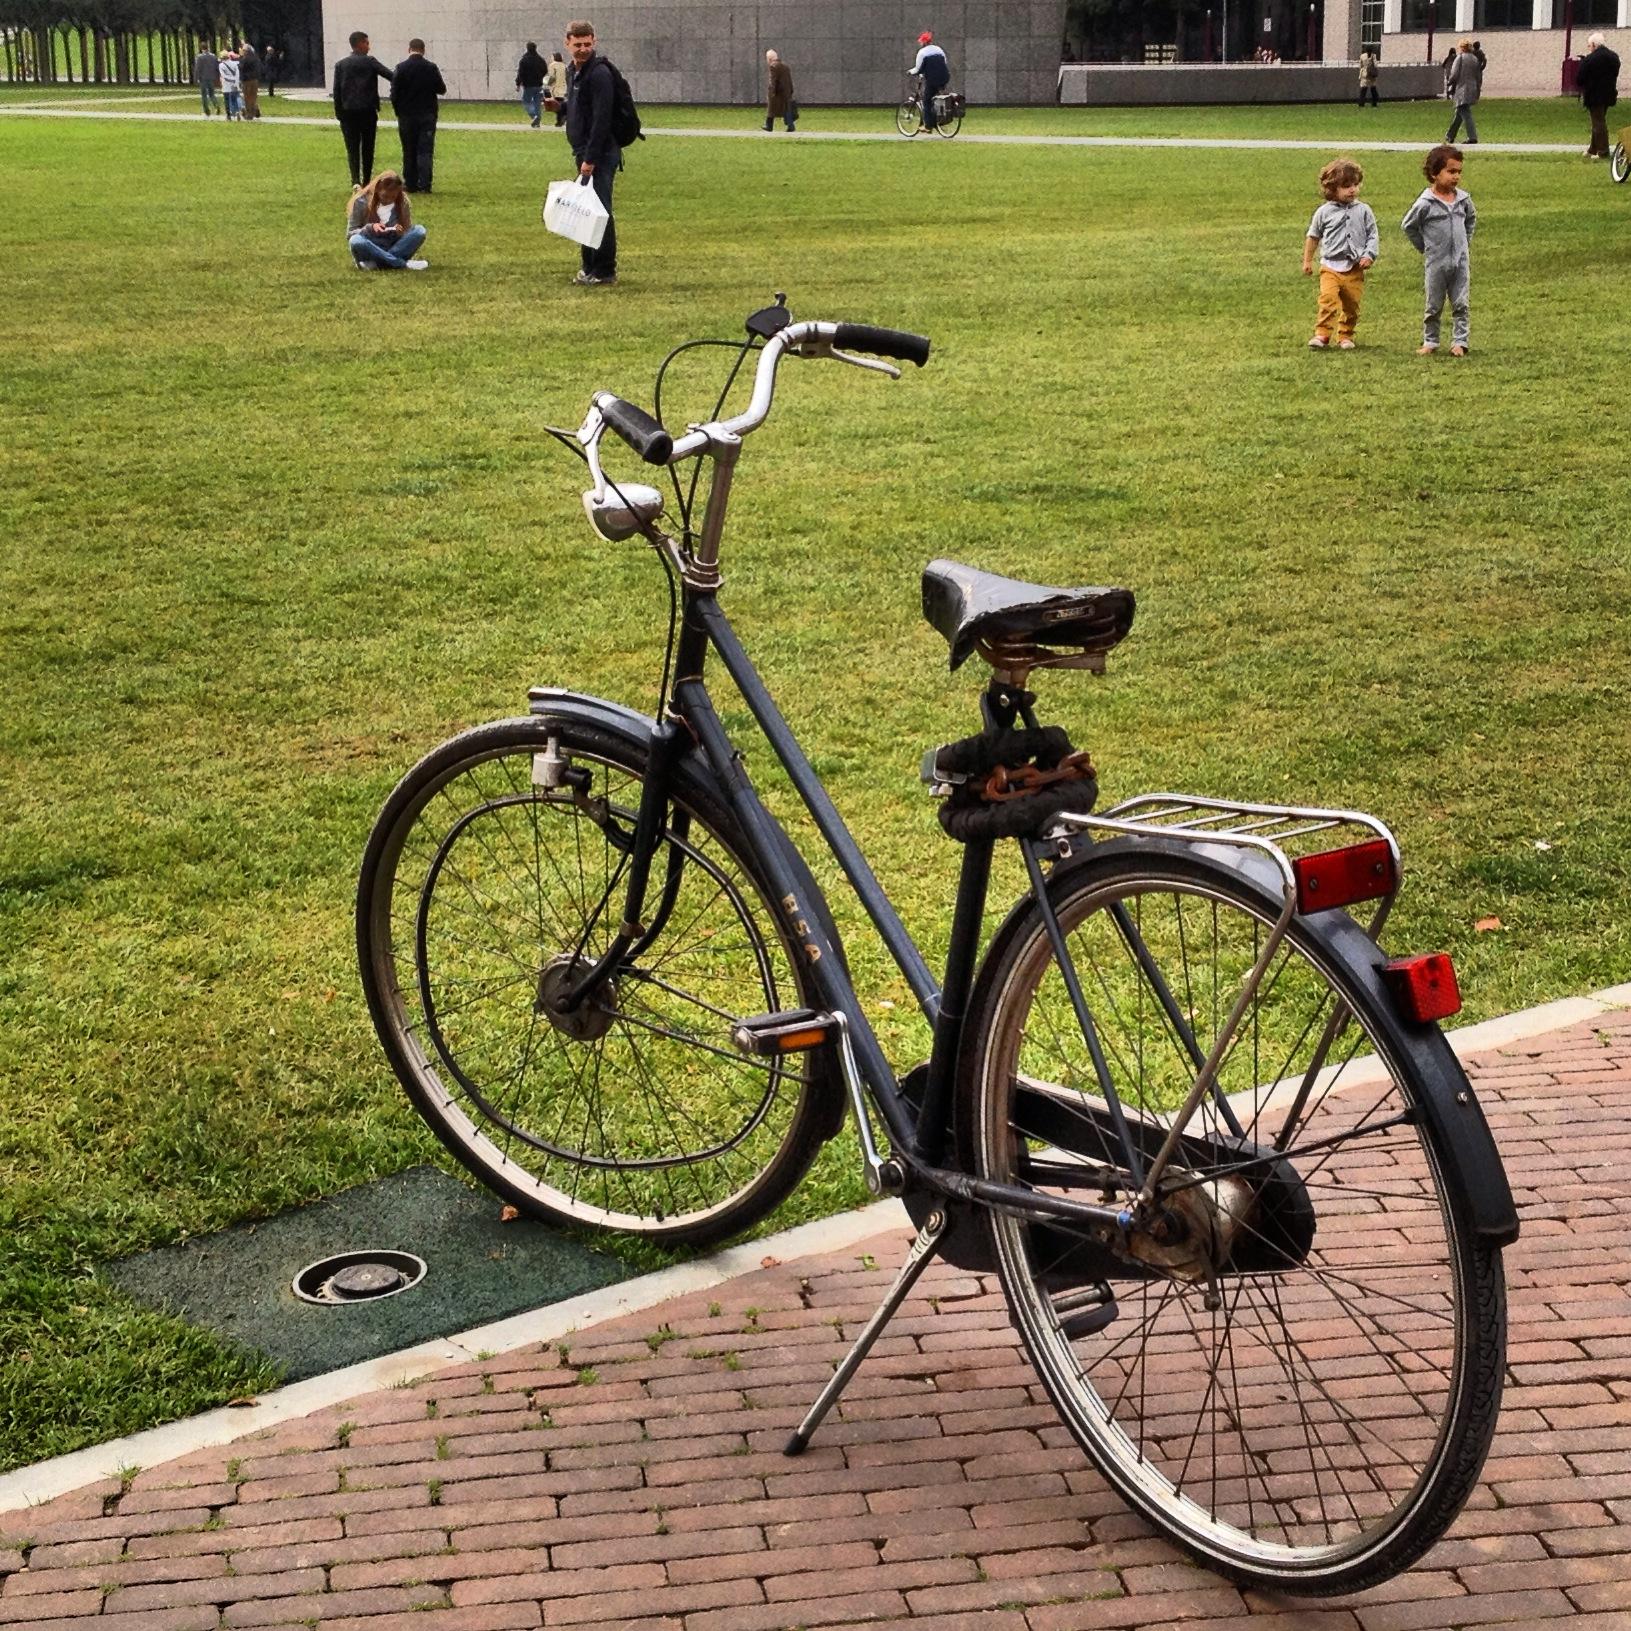 My 30 euro bike: photo by Arlen Stawasz